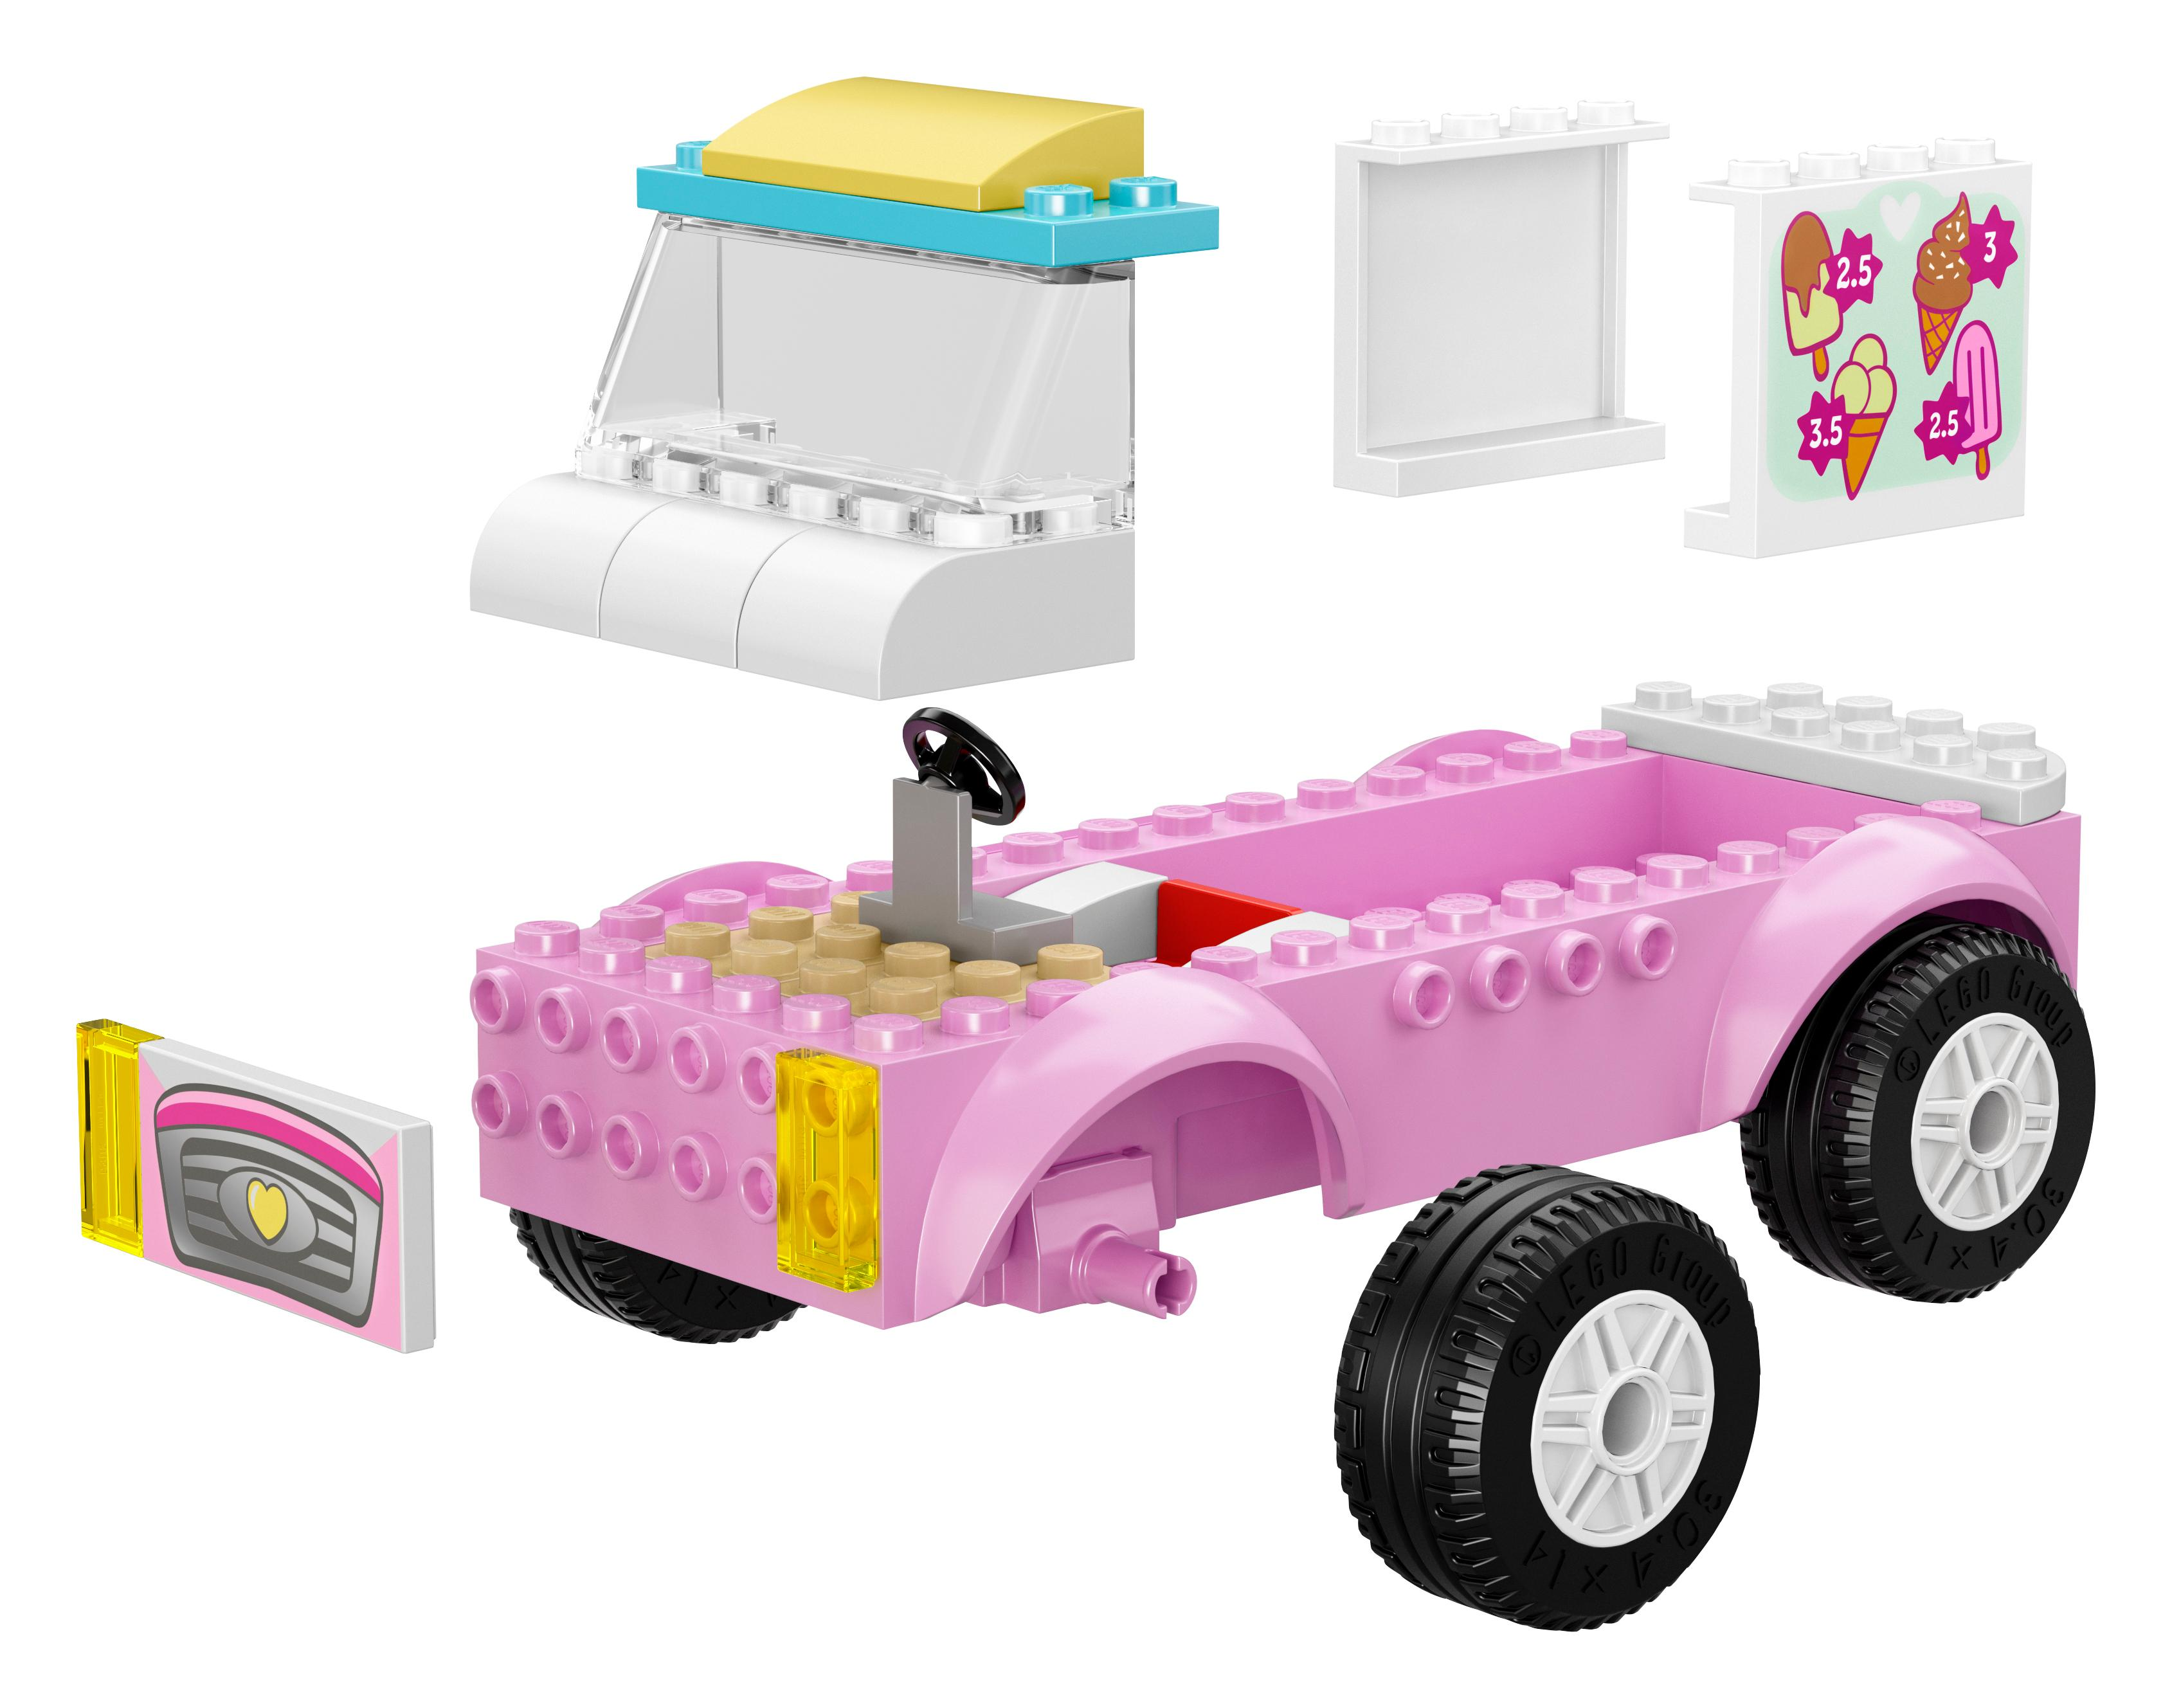 lego juniors 10727 emmas eiswagen spielzeug f r vier j hrige spielzeug. Black Bedroom Furniture Sets. Home Design Ideas